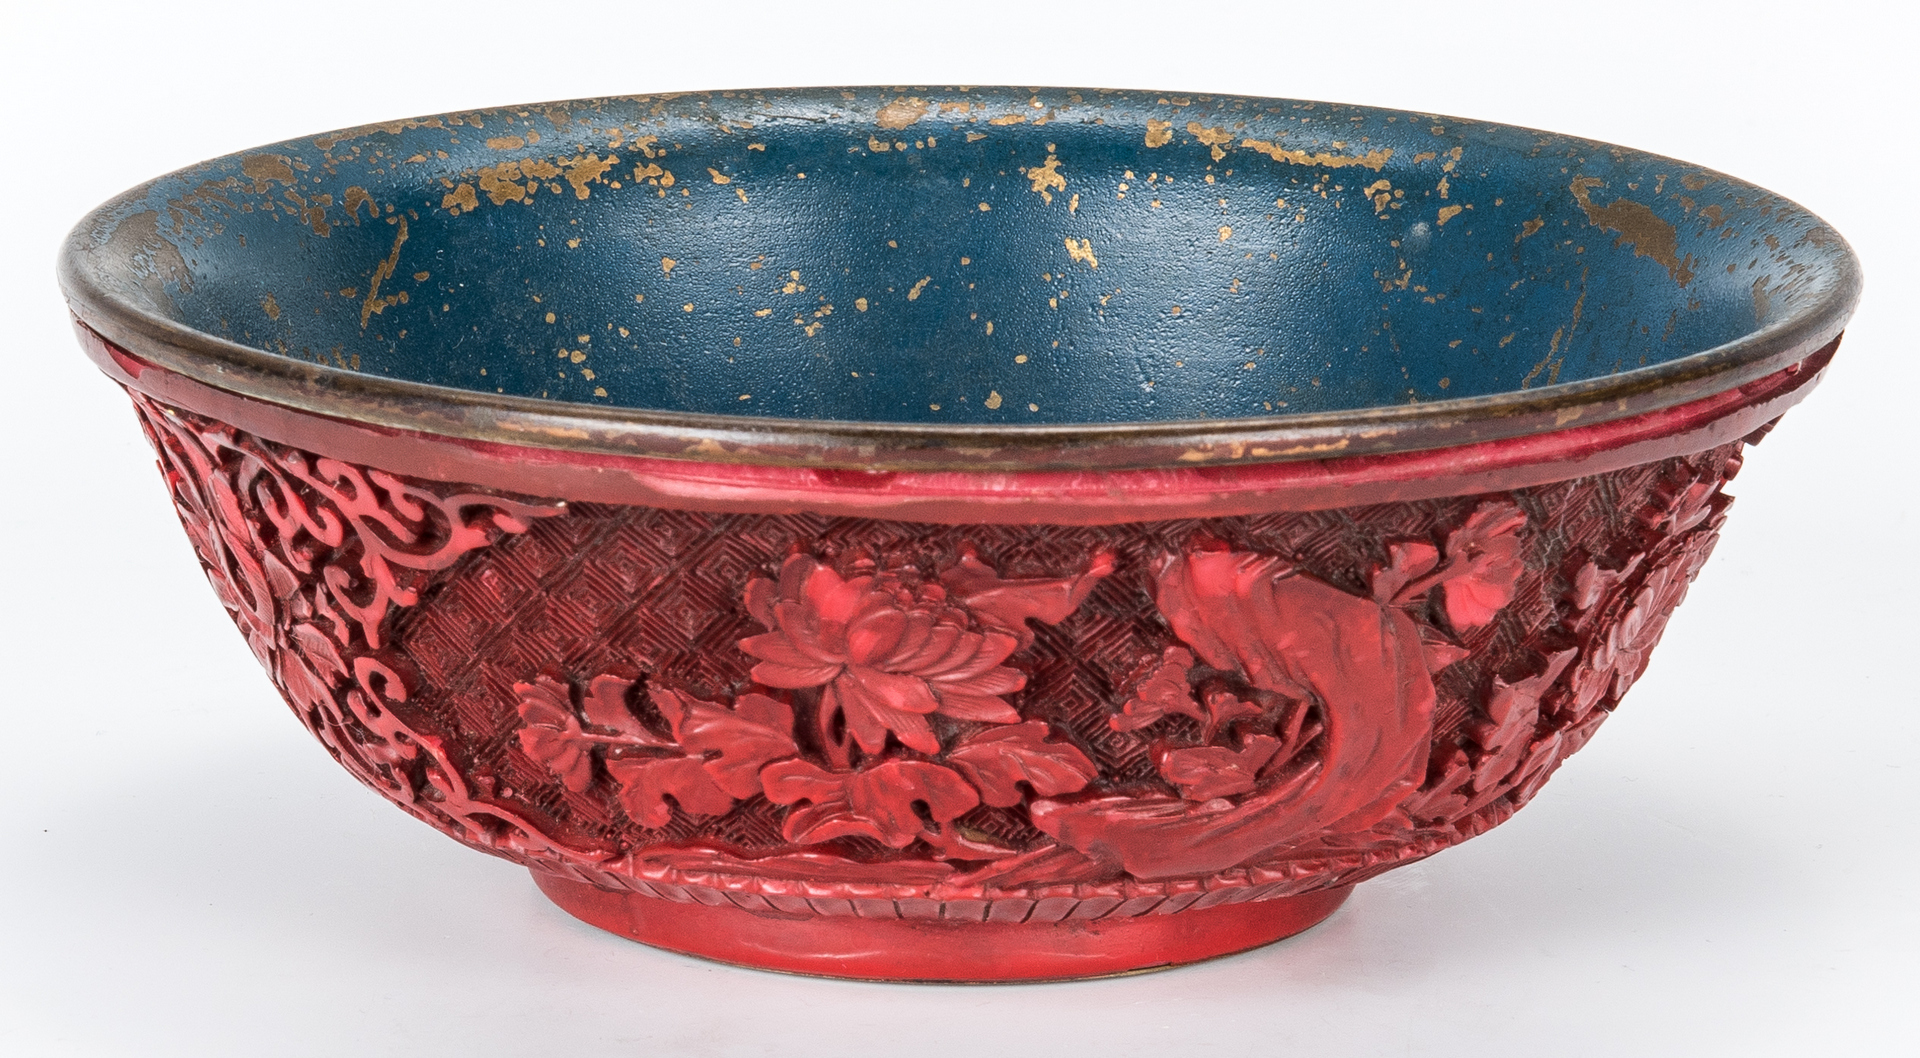 Lot 968: 1 Celadon Jade & 3 Carved Hardstone Items, 1 Cinnabar Bowl